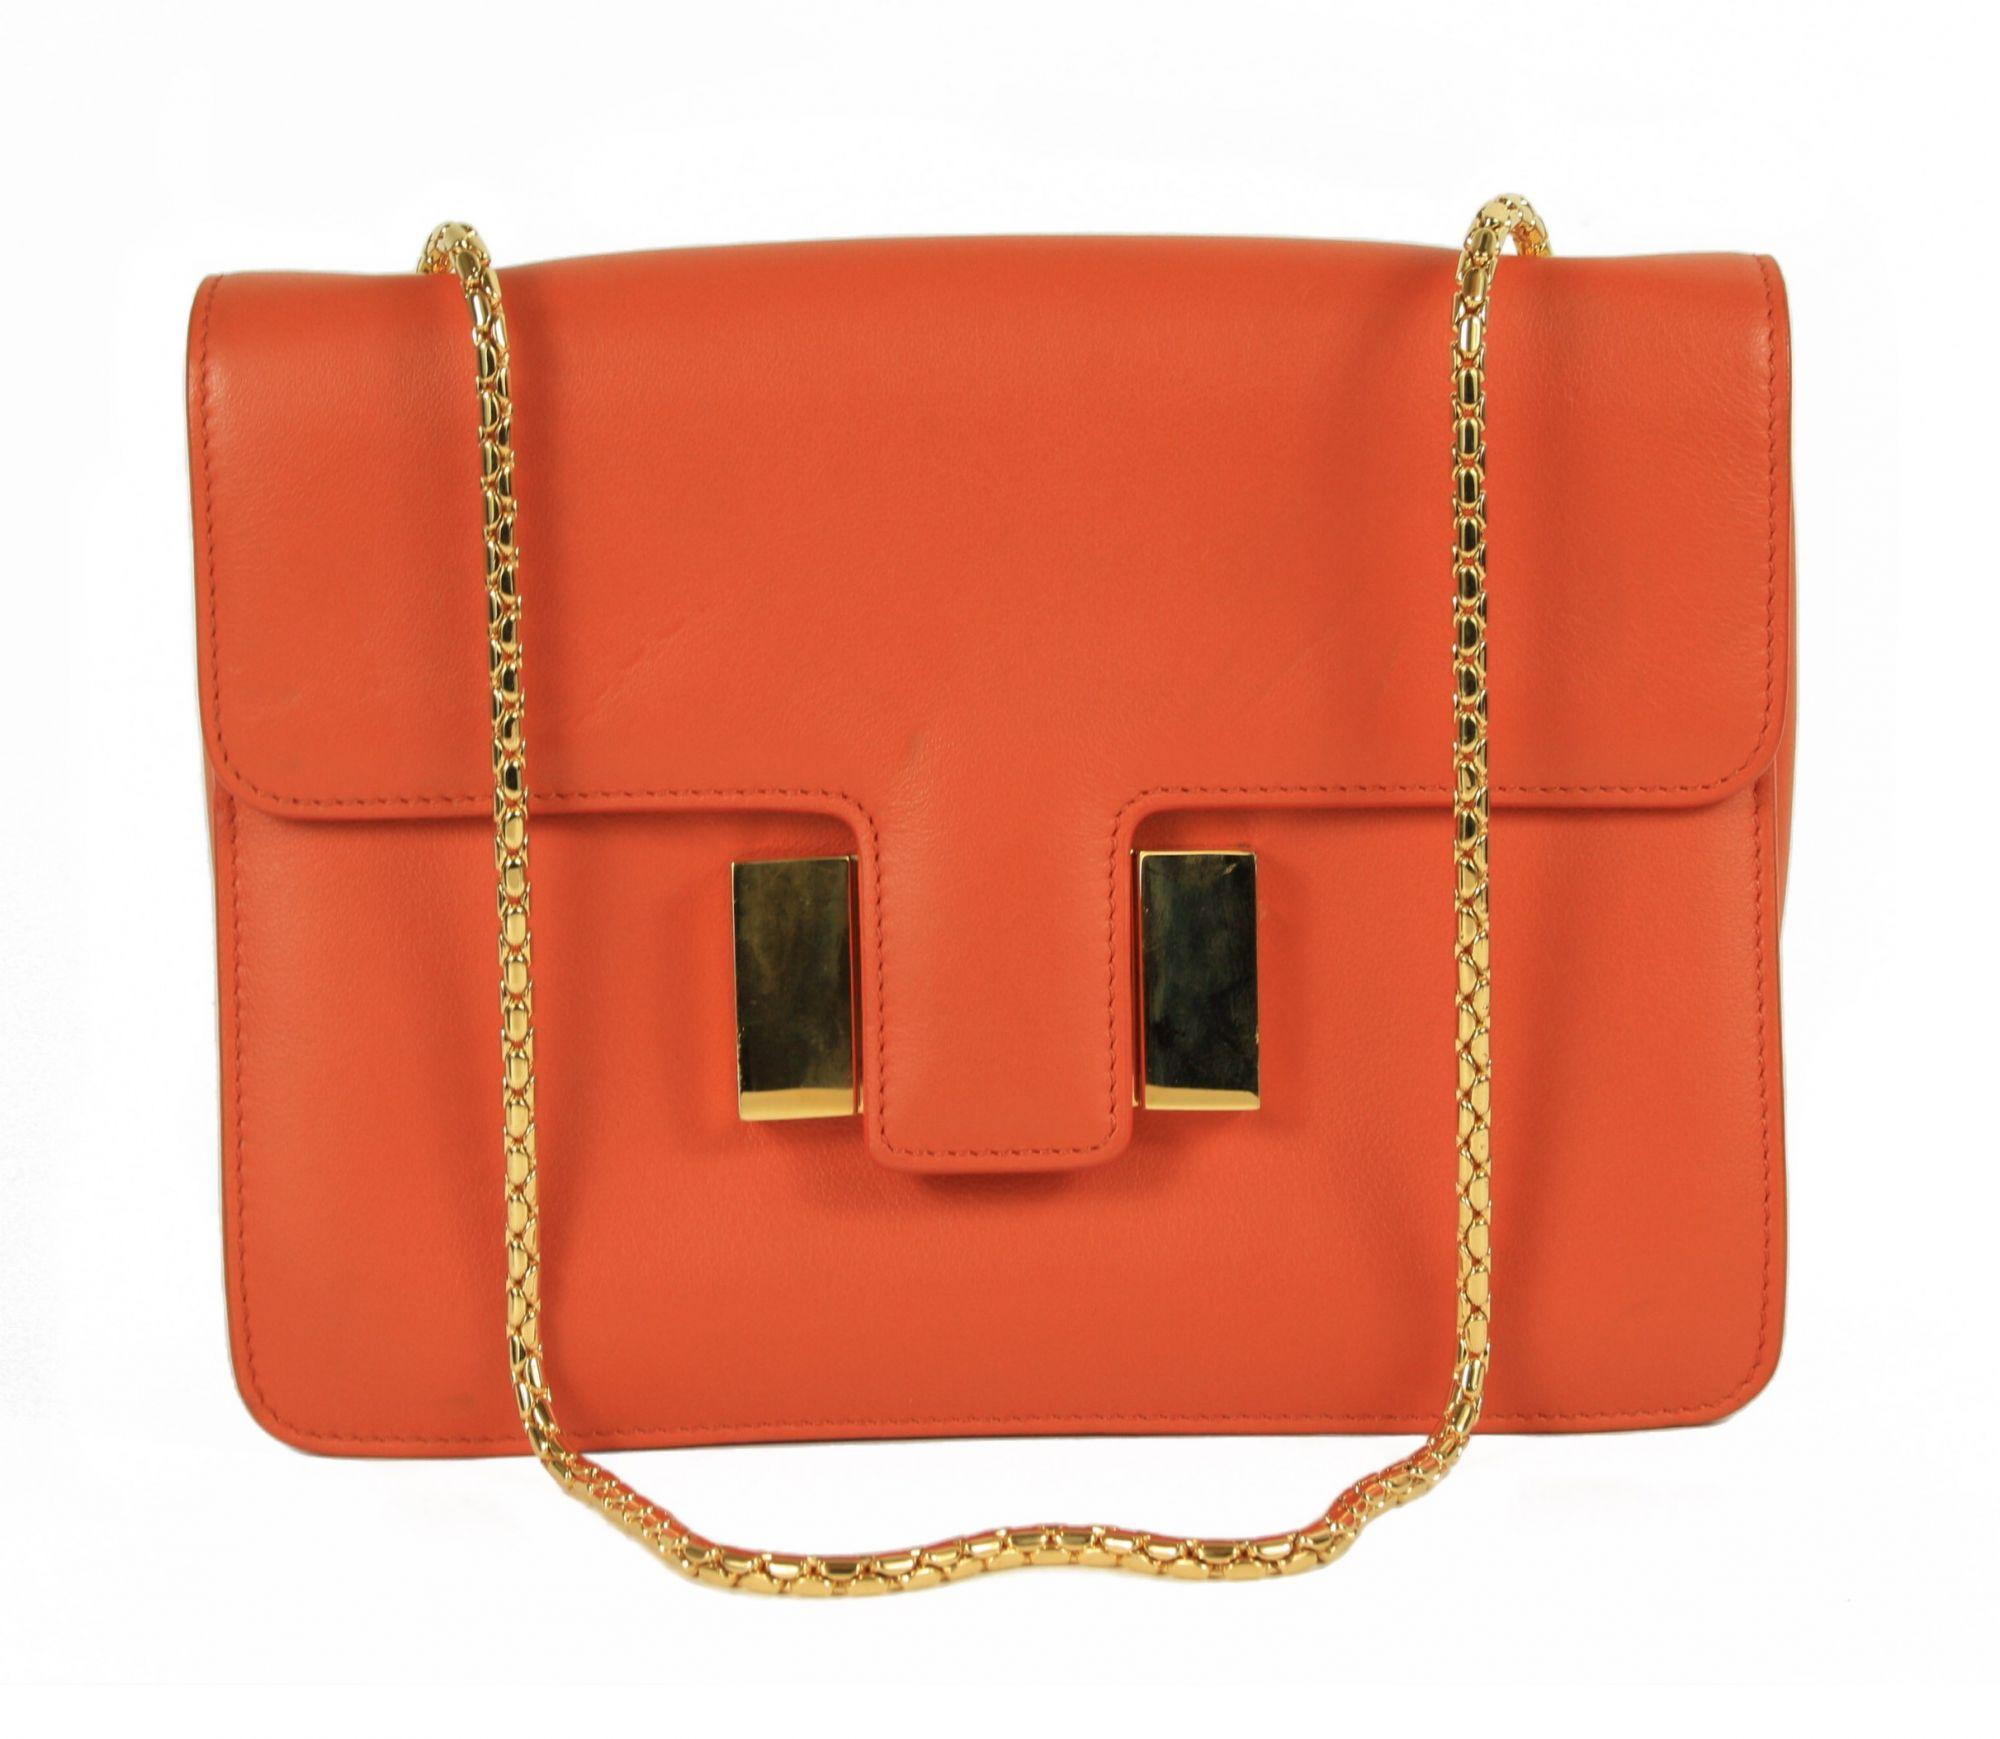 Sienna Crossbody Bag